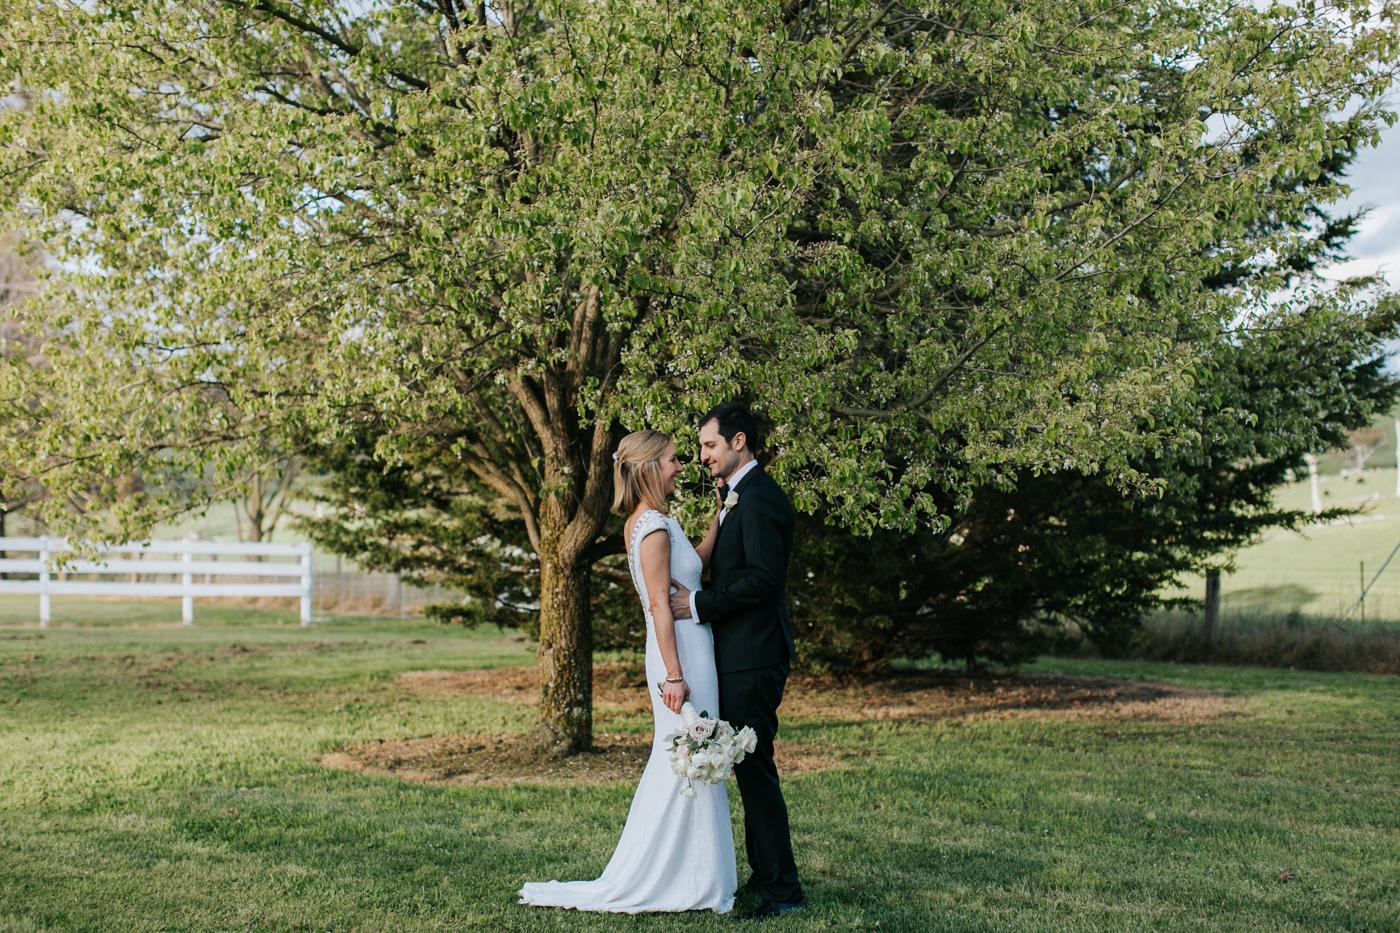 Bridget & James - Orange Country Wedding - Samantha Heather Photography-117.jpg